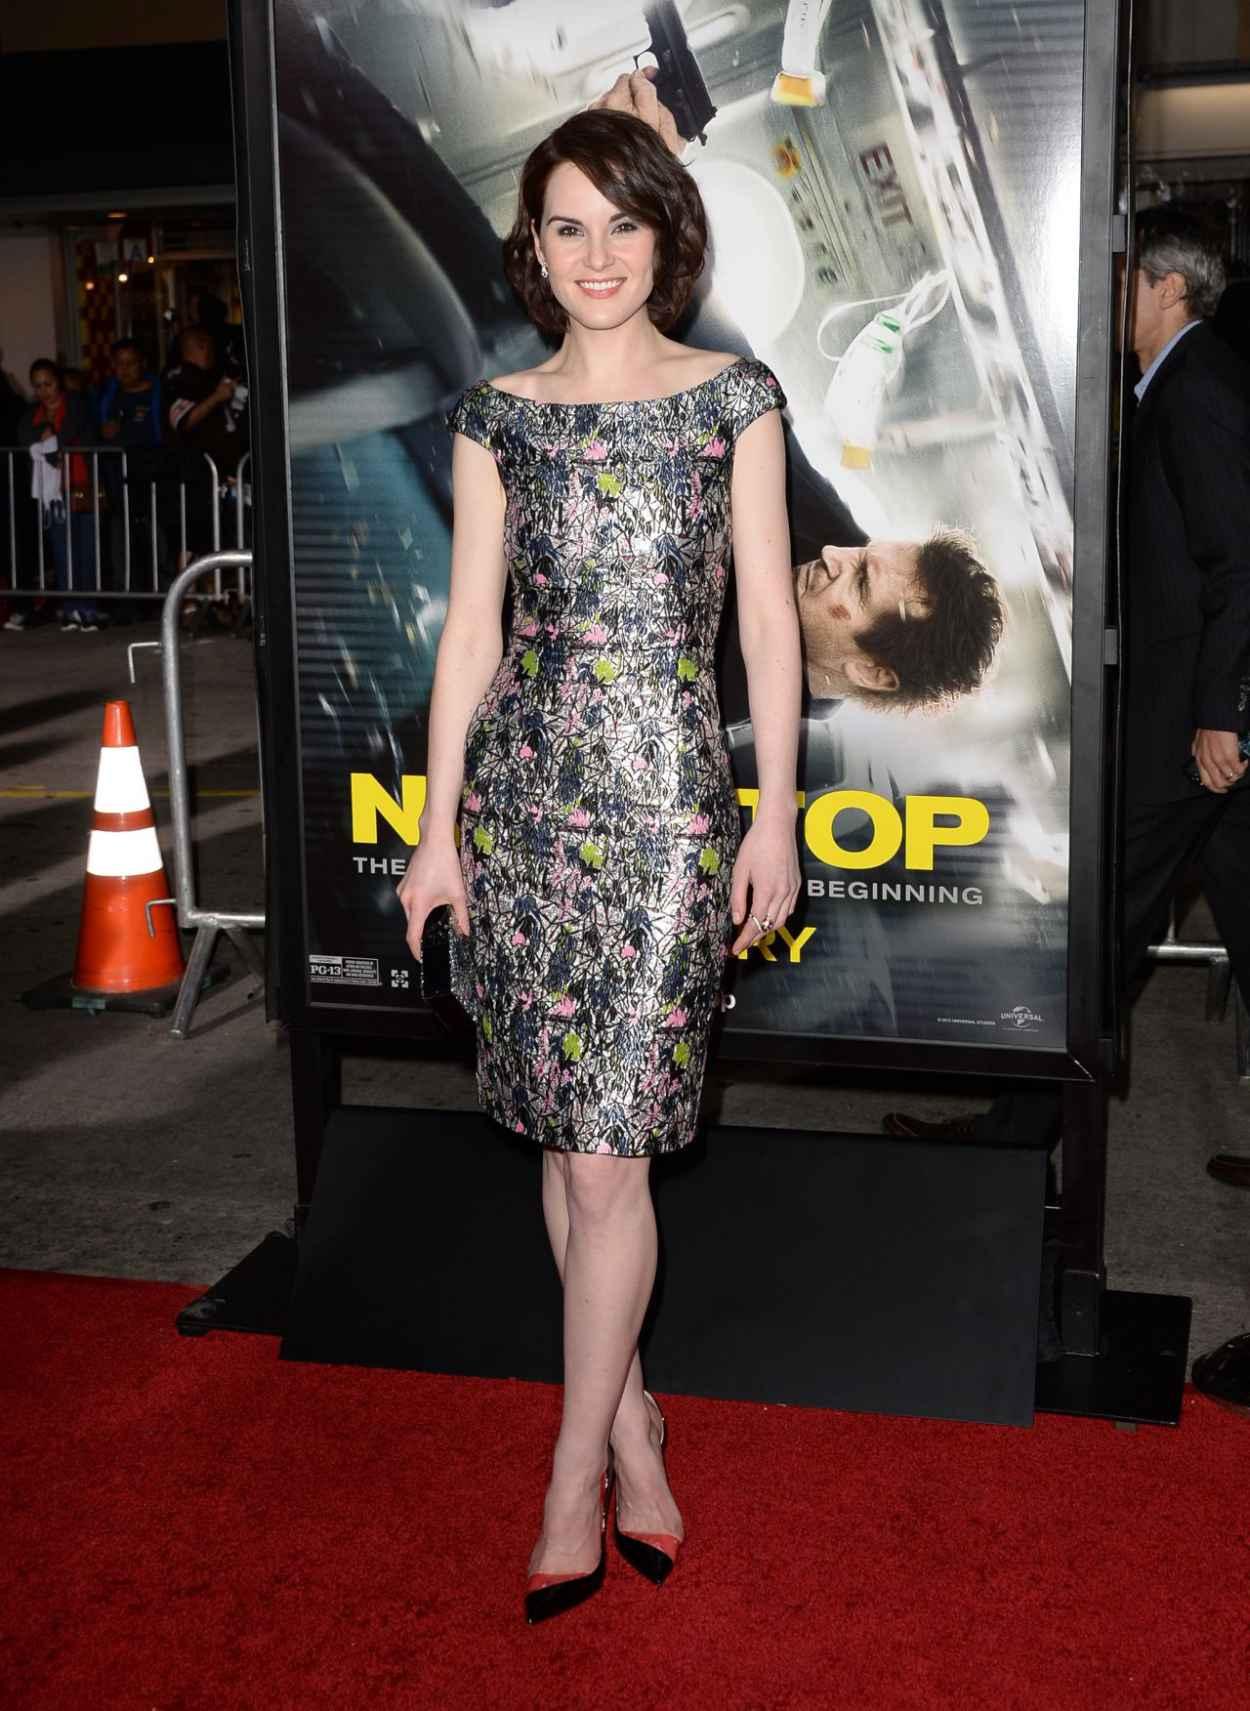 Michelle Dockery Wearing Christian Dior Lurex Dress - -Non-Stop- LA Premiere-2